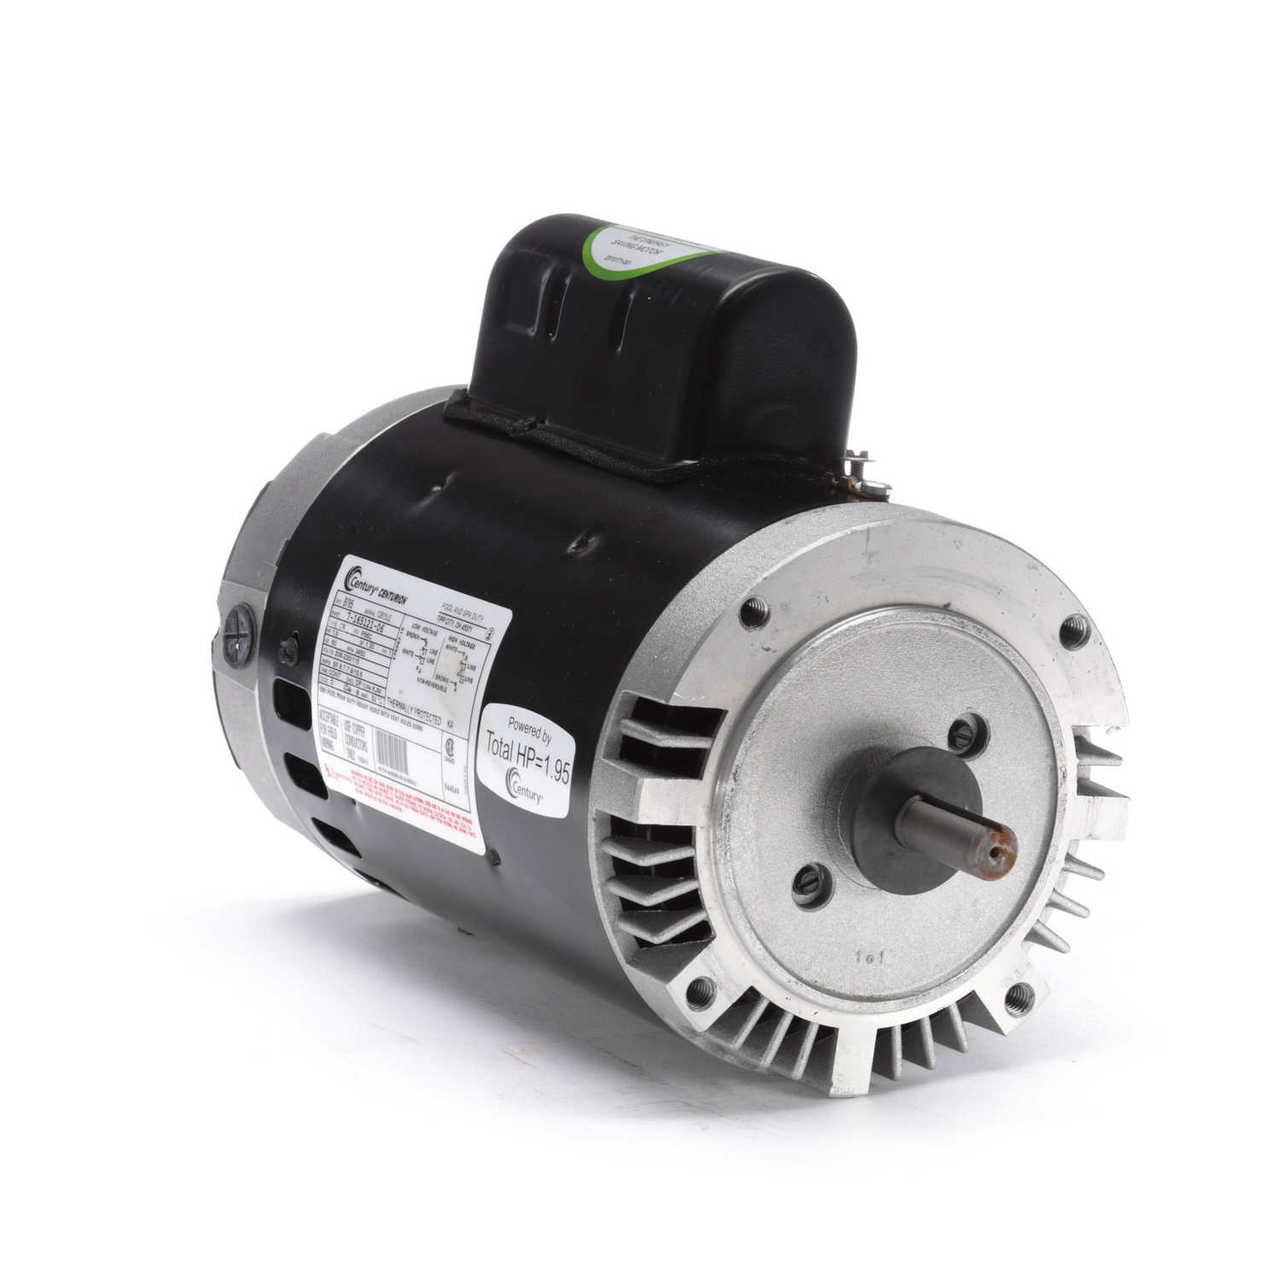 CENTURY B796 Pool Motor,1.5 HP,3450 RPM,115//208-230V